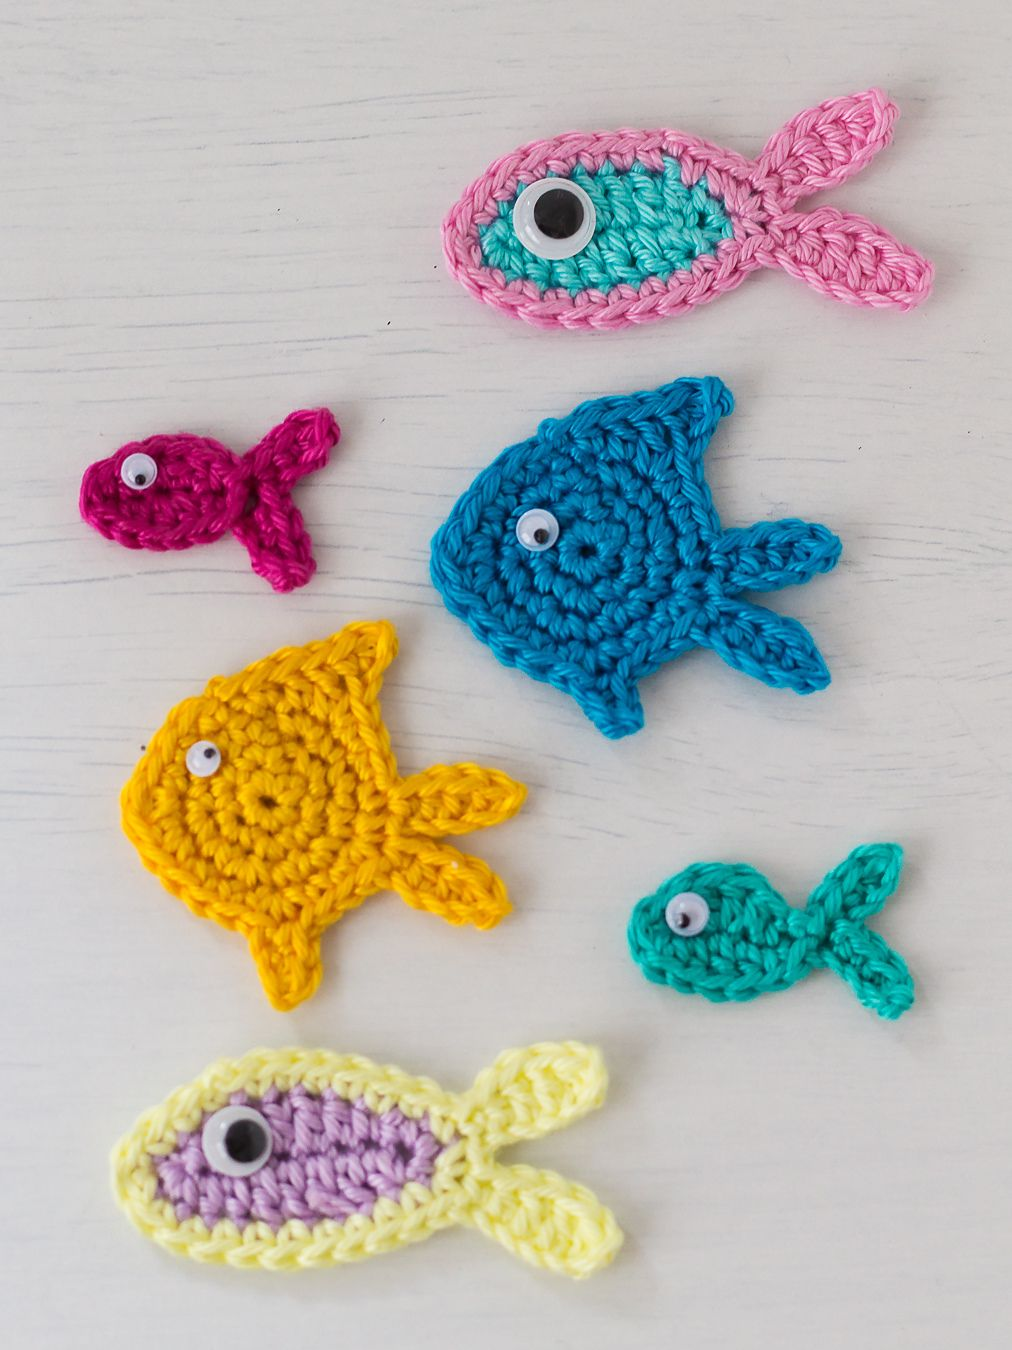 Three little fish crochet appliques by carmen rosemann free three little fish crochet appliques by carmen rosemann free crochet patterns ravelry bankloansurffo Choice Image